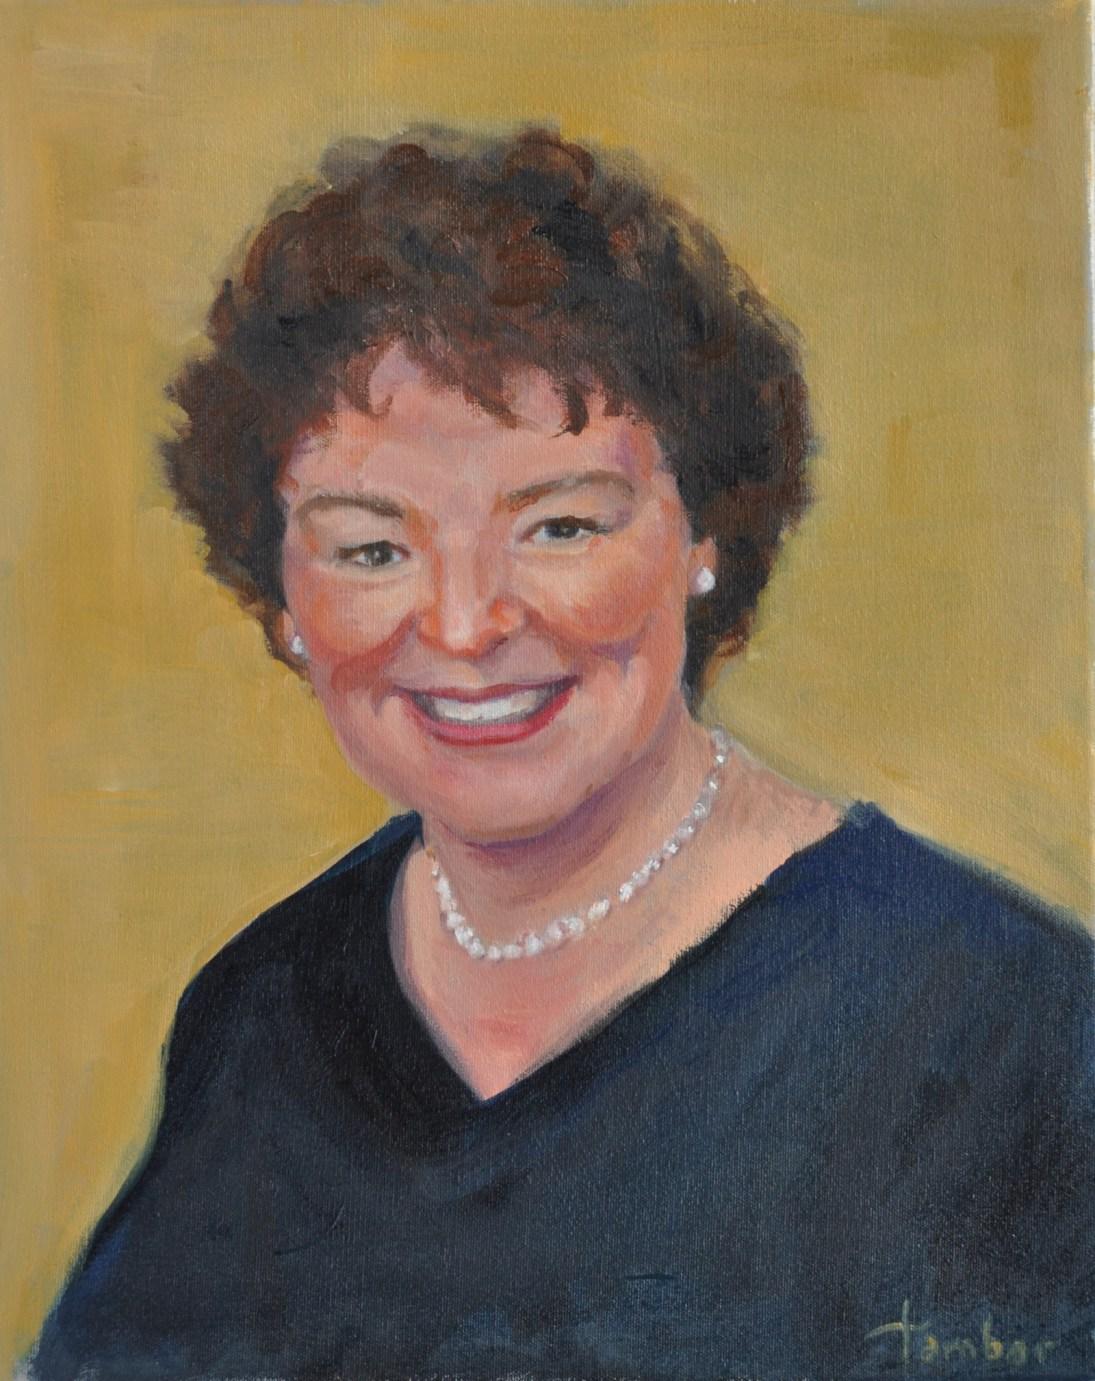 Joyce McMillan, Scotsman journalist